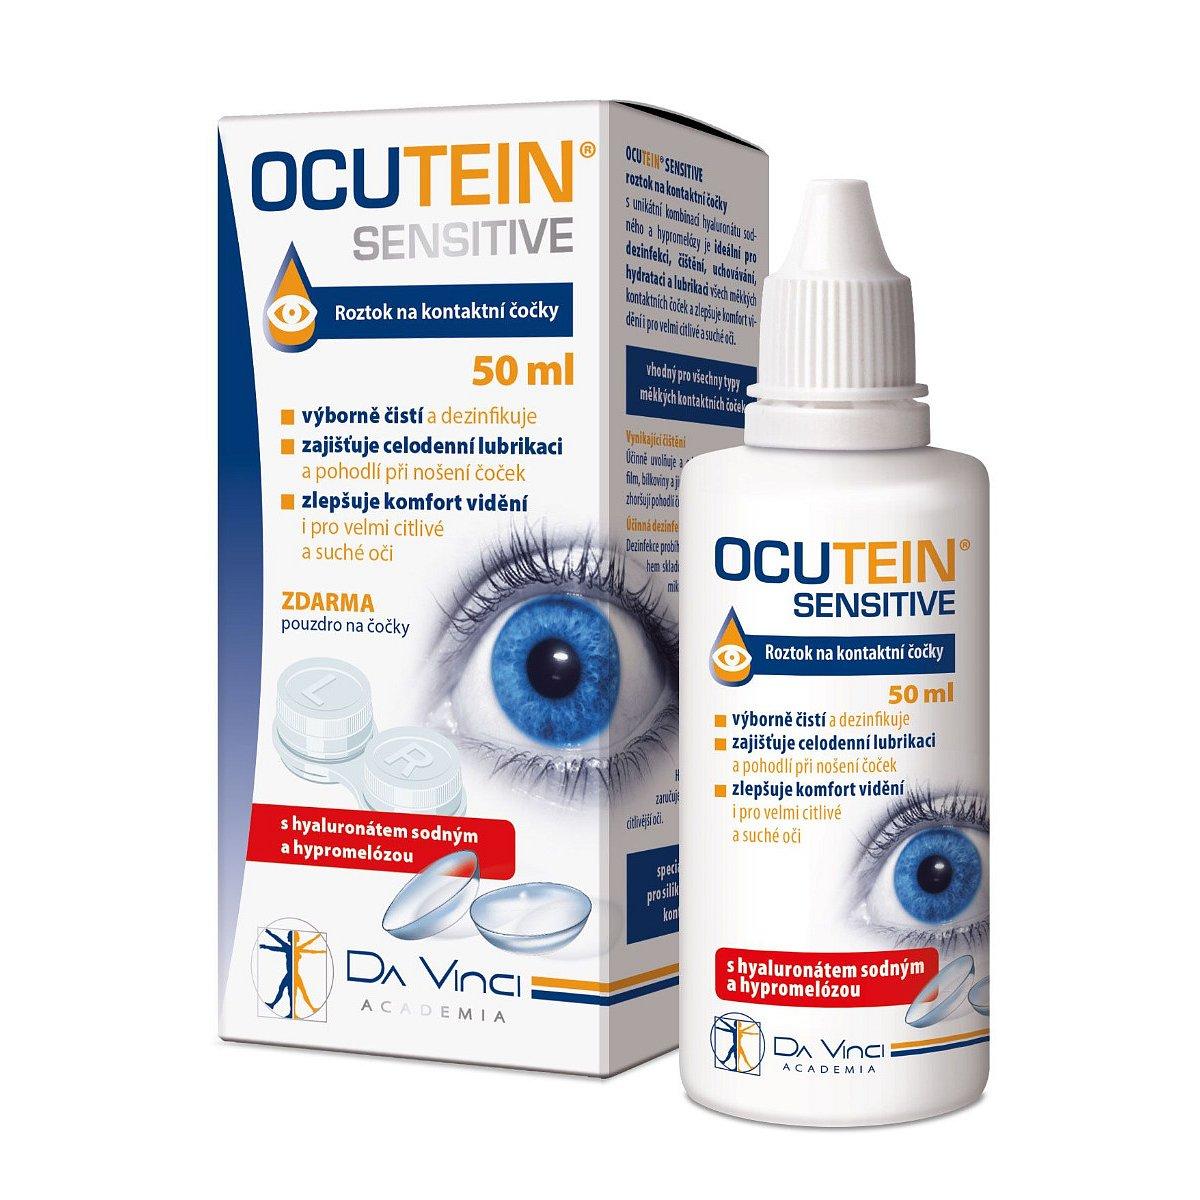 Ocutein SENSITIVE roztok na kontaktní čočky 50 ml